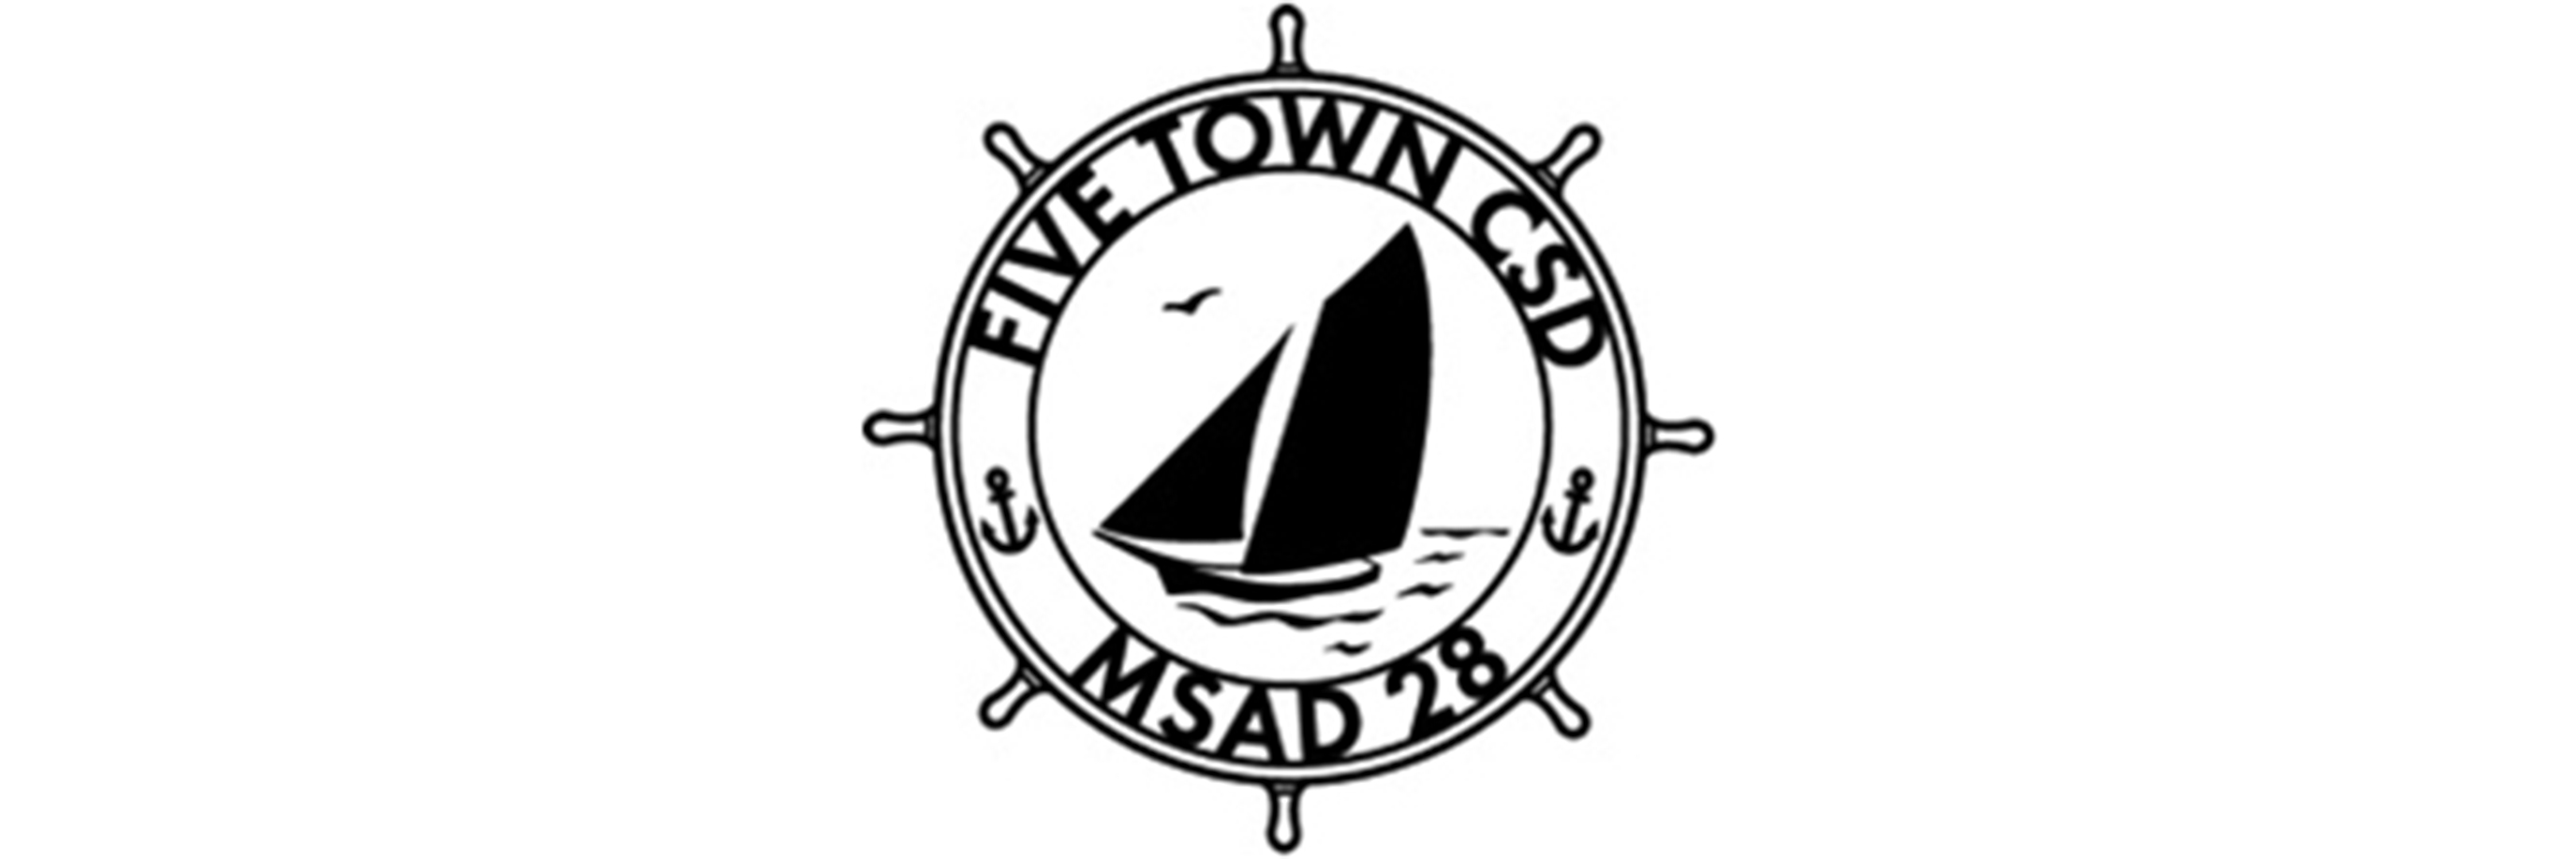 Five Town CSD/MSAD #28